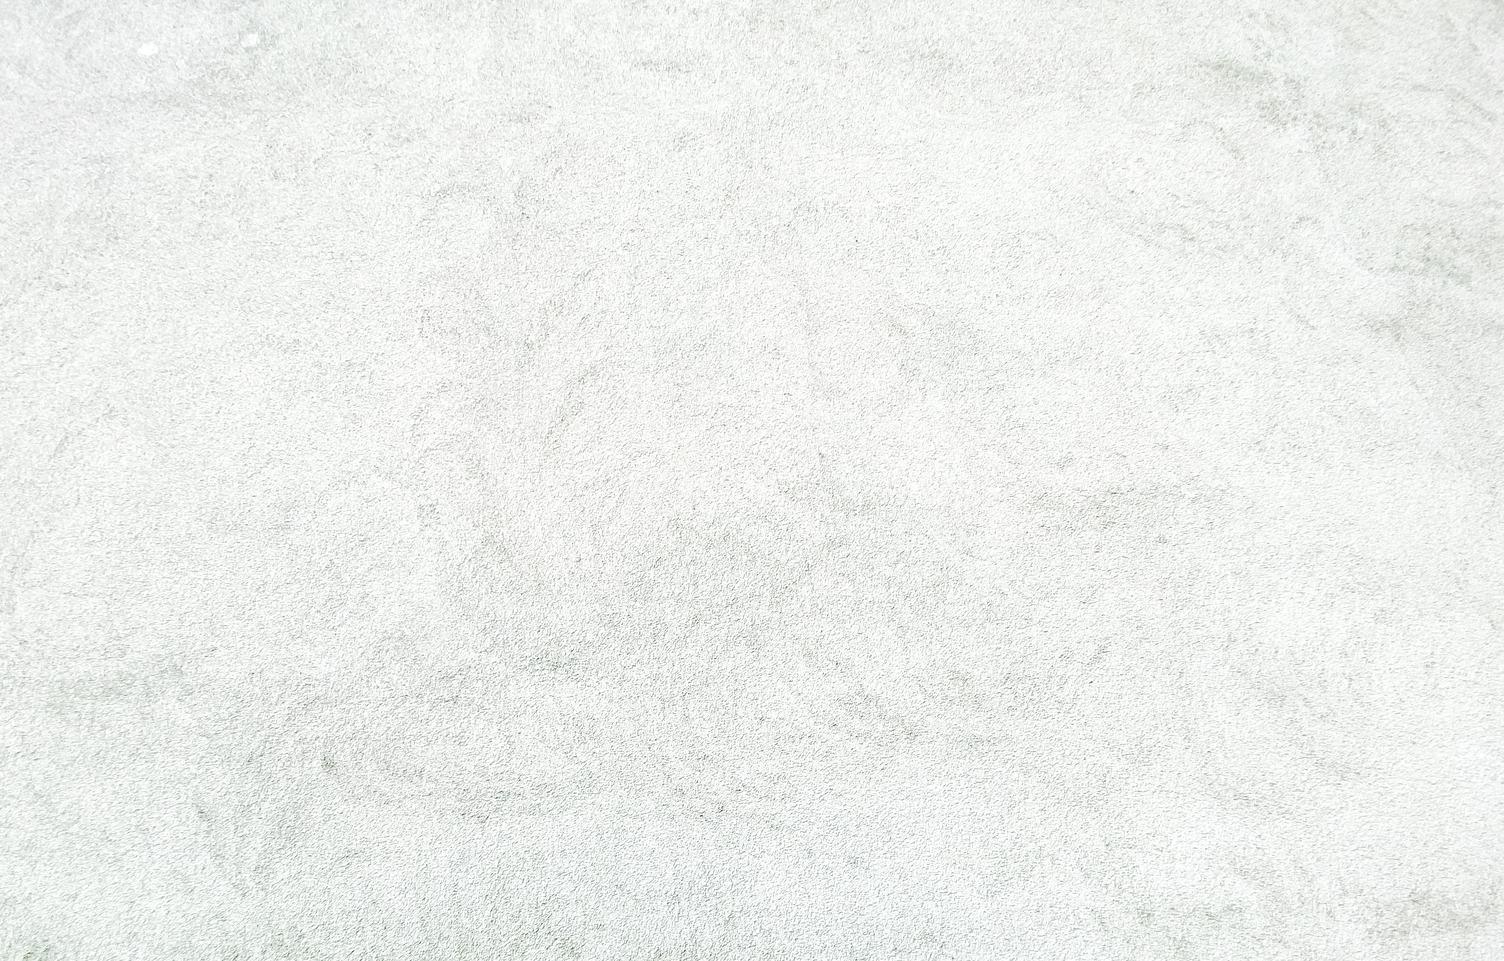 Gray Plaster Wall Texture